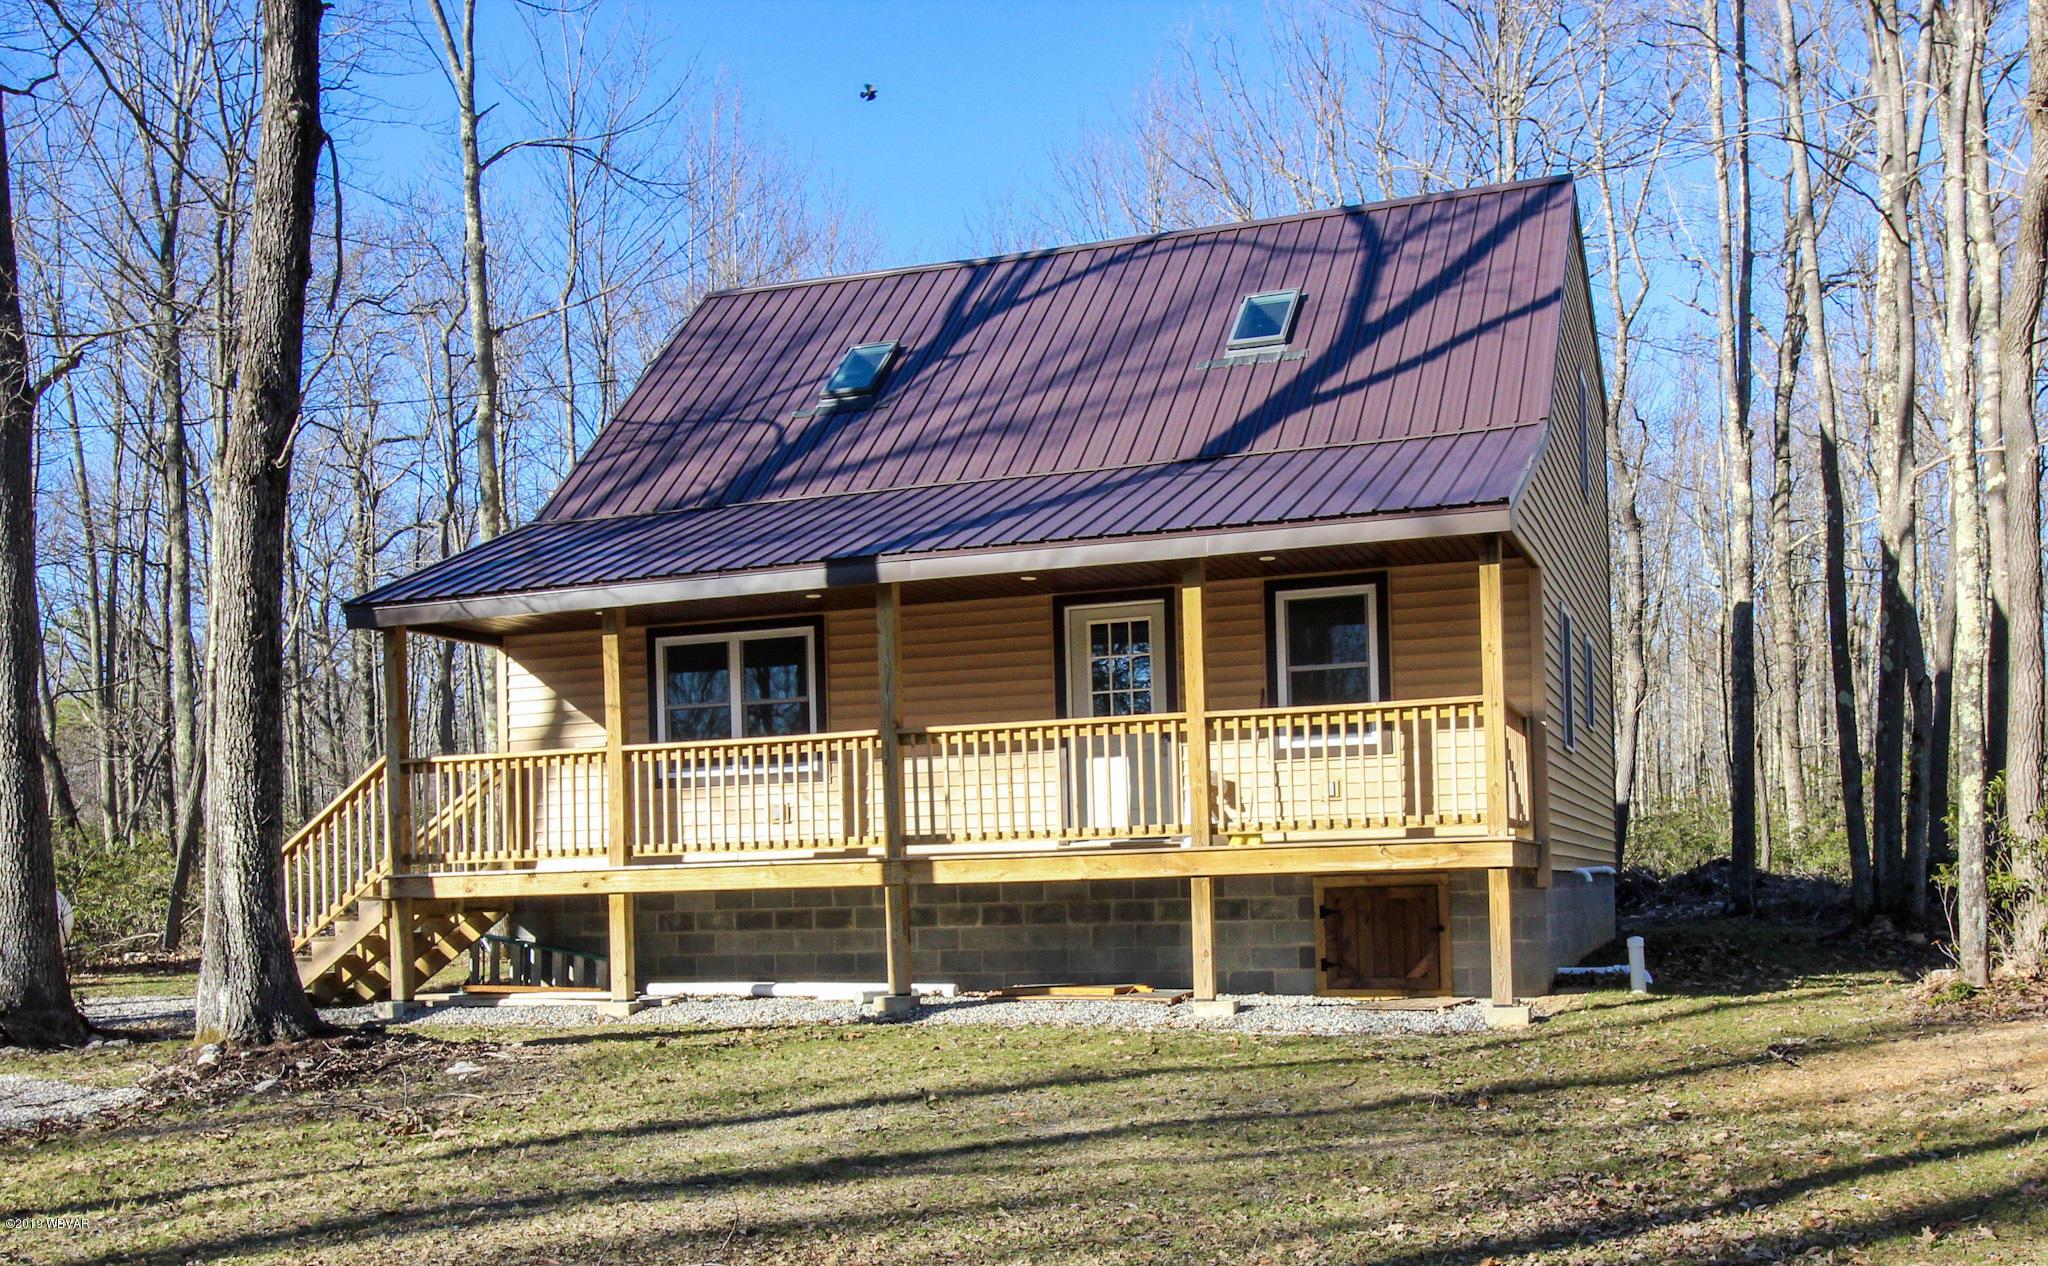 125 COYOTE RIDGE,Lock Haven,PA 17745,3 Bedrooms Bedrooms,2 BathroomsBathrooms,Residential,COYOTE,WB-86947